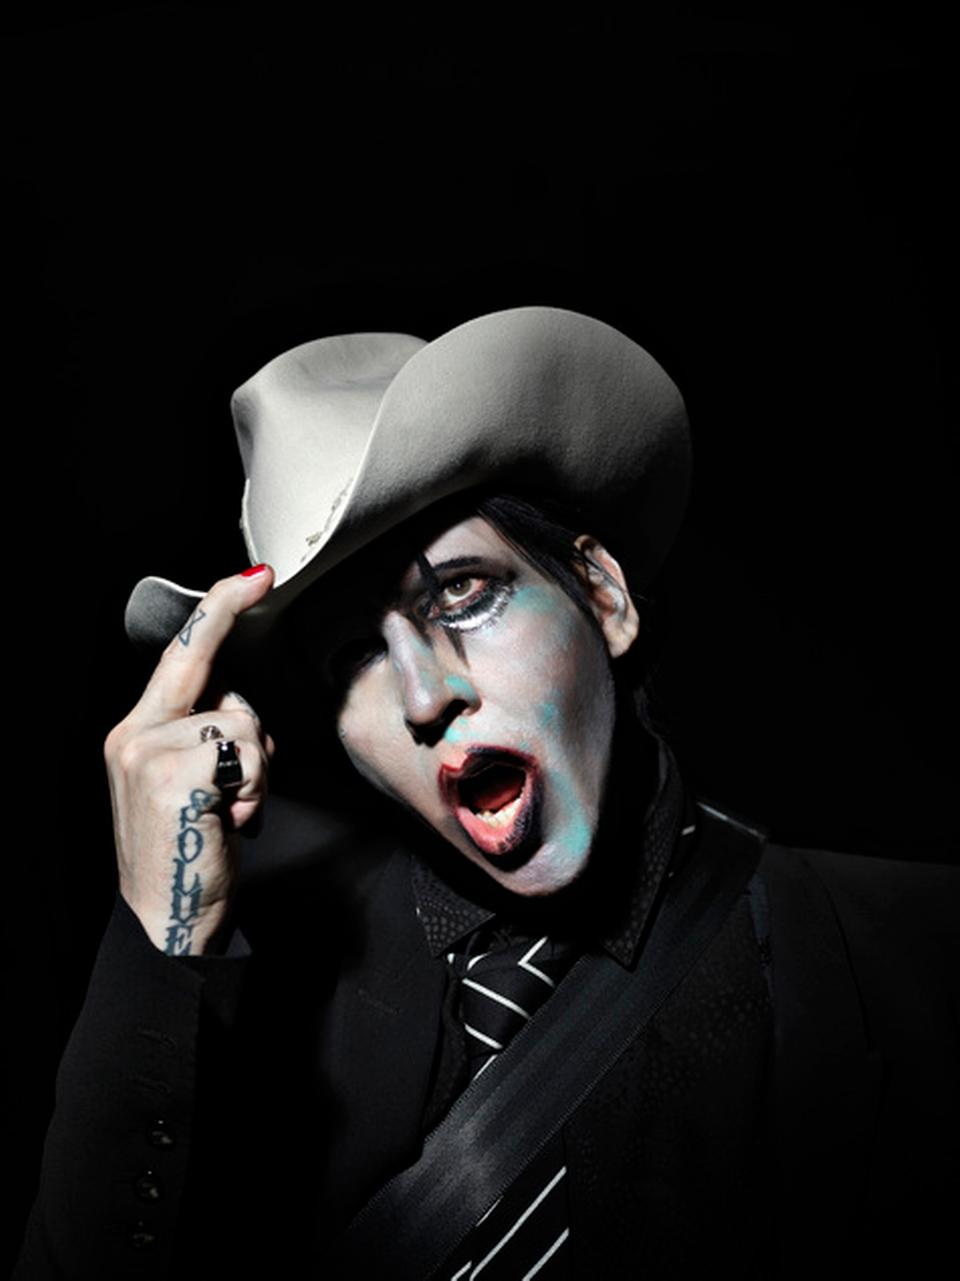 Musically Halloween 2020 Marilyn Manson gradually looks like an accountant on her way to a